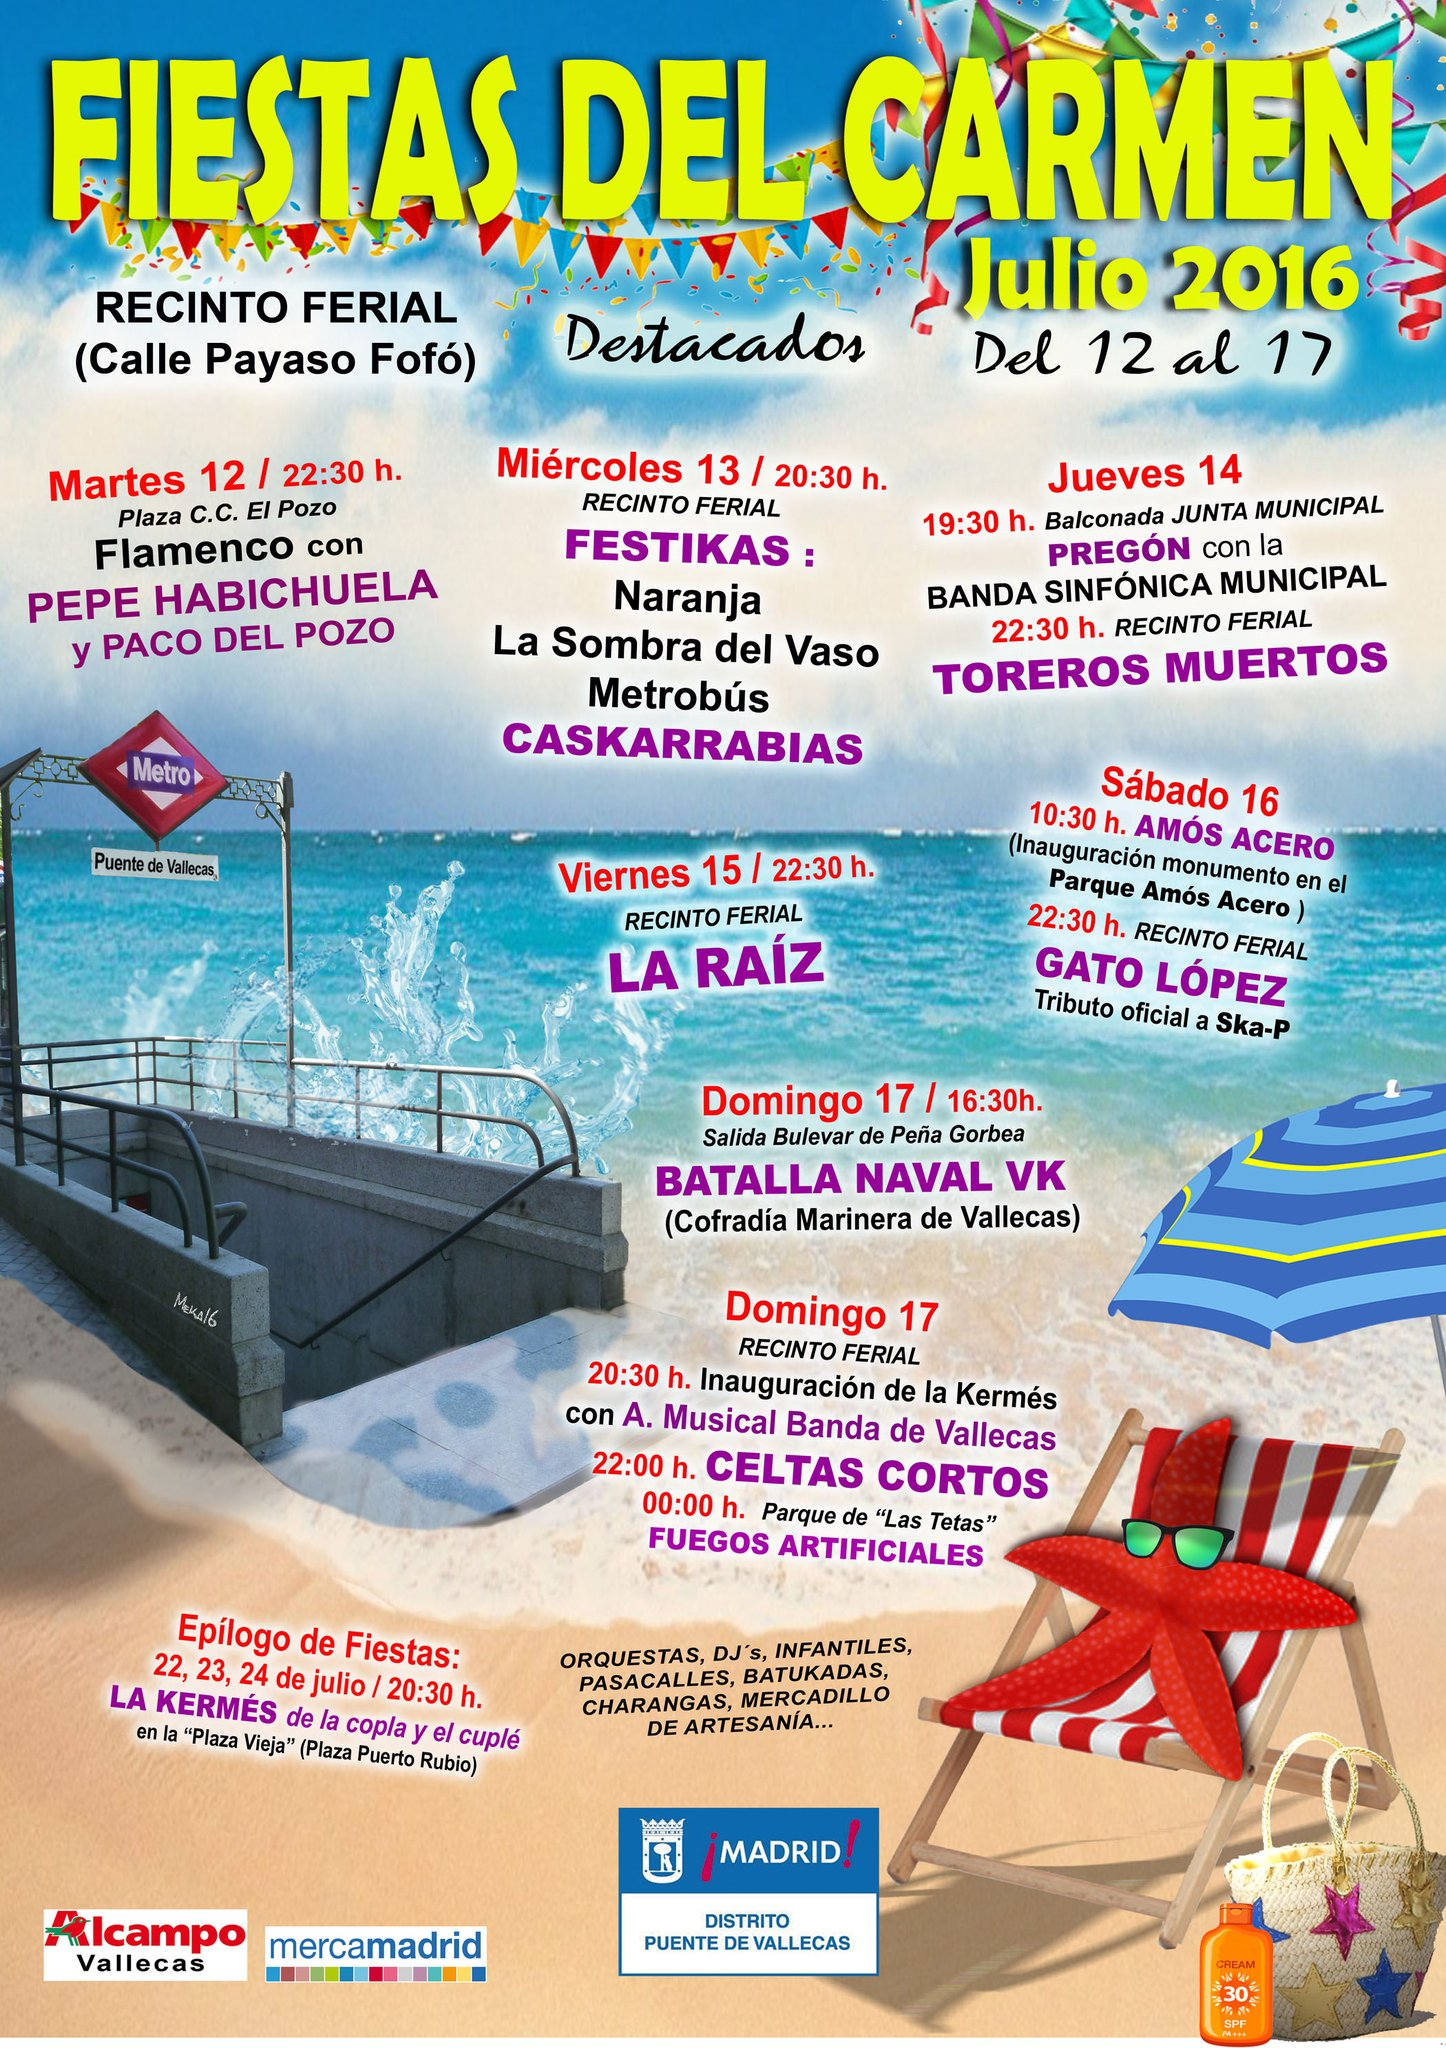 fiestasdelcarmen2016Vallecas_01